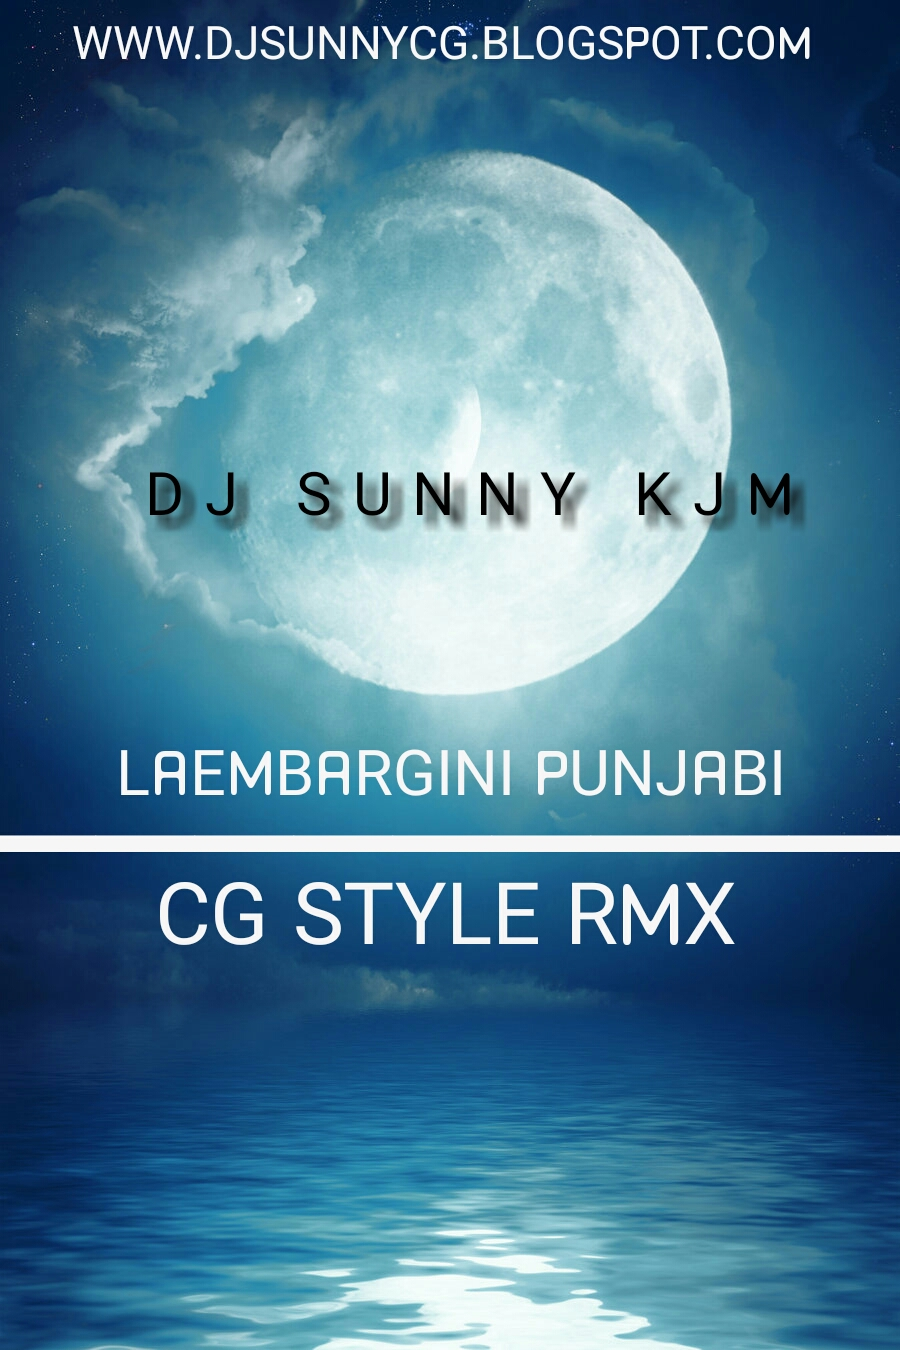 DJ SUNNY KJM